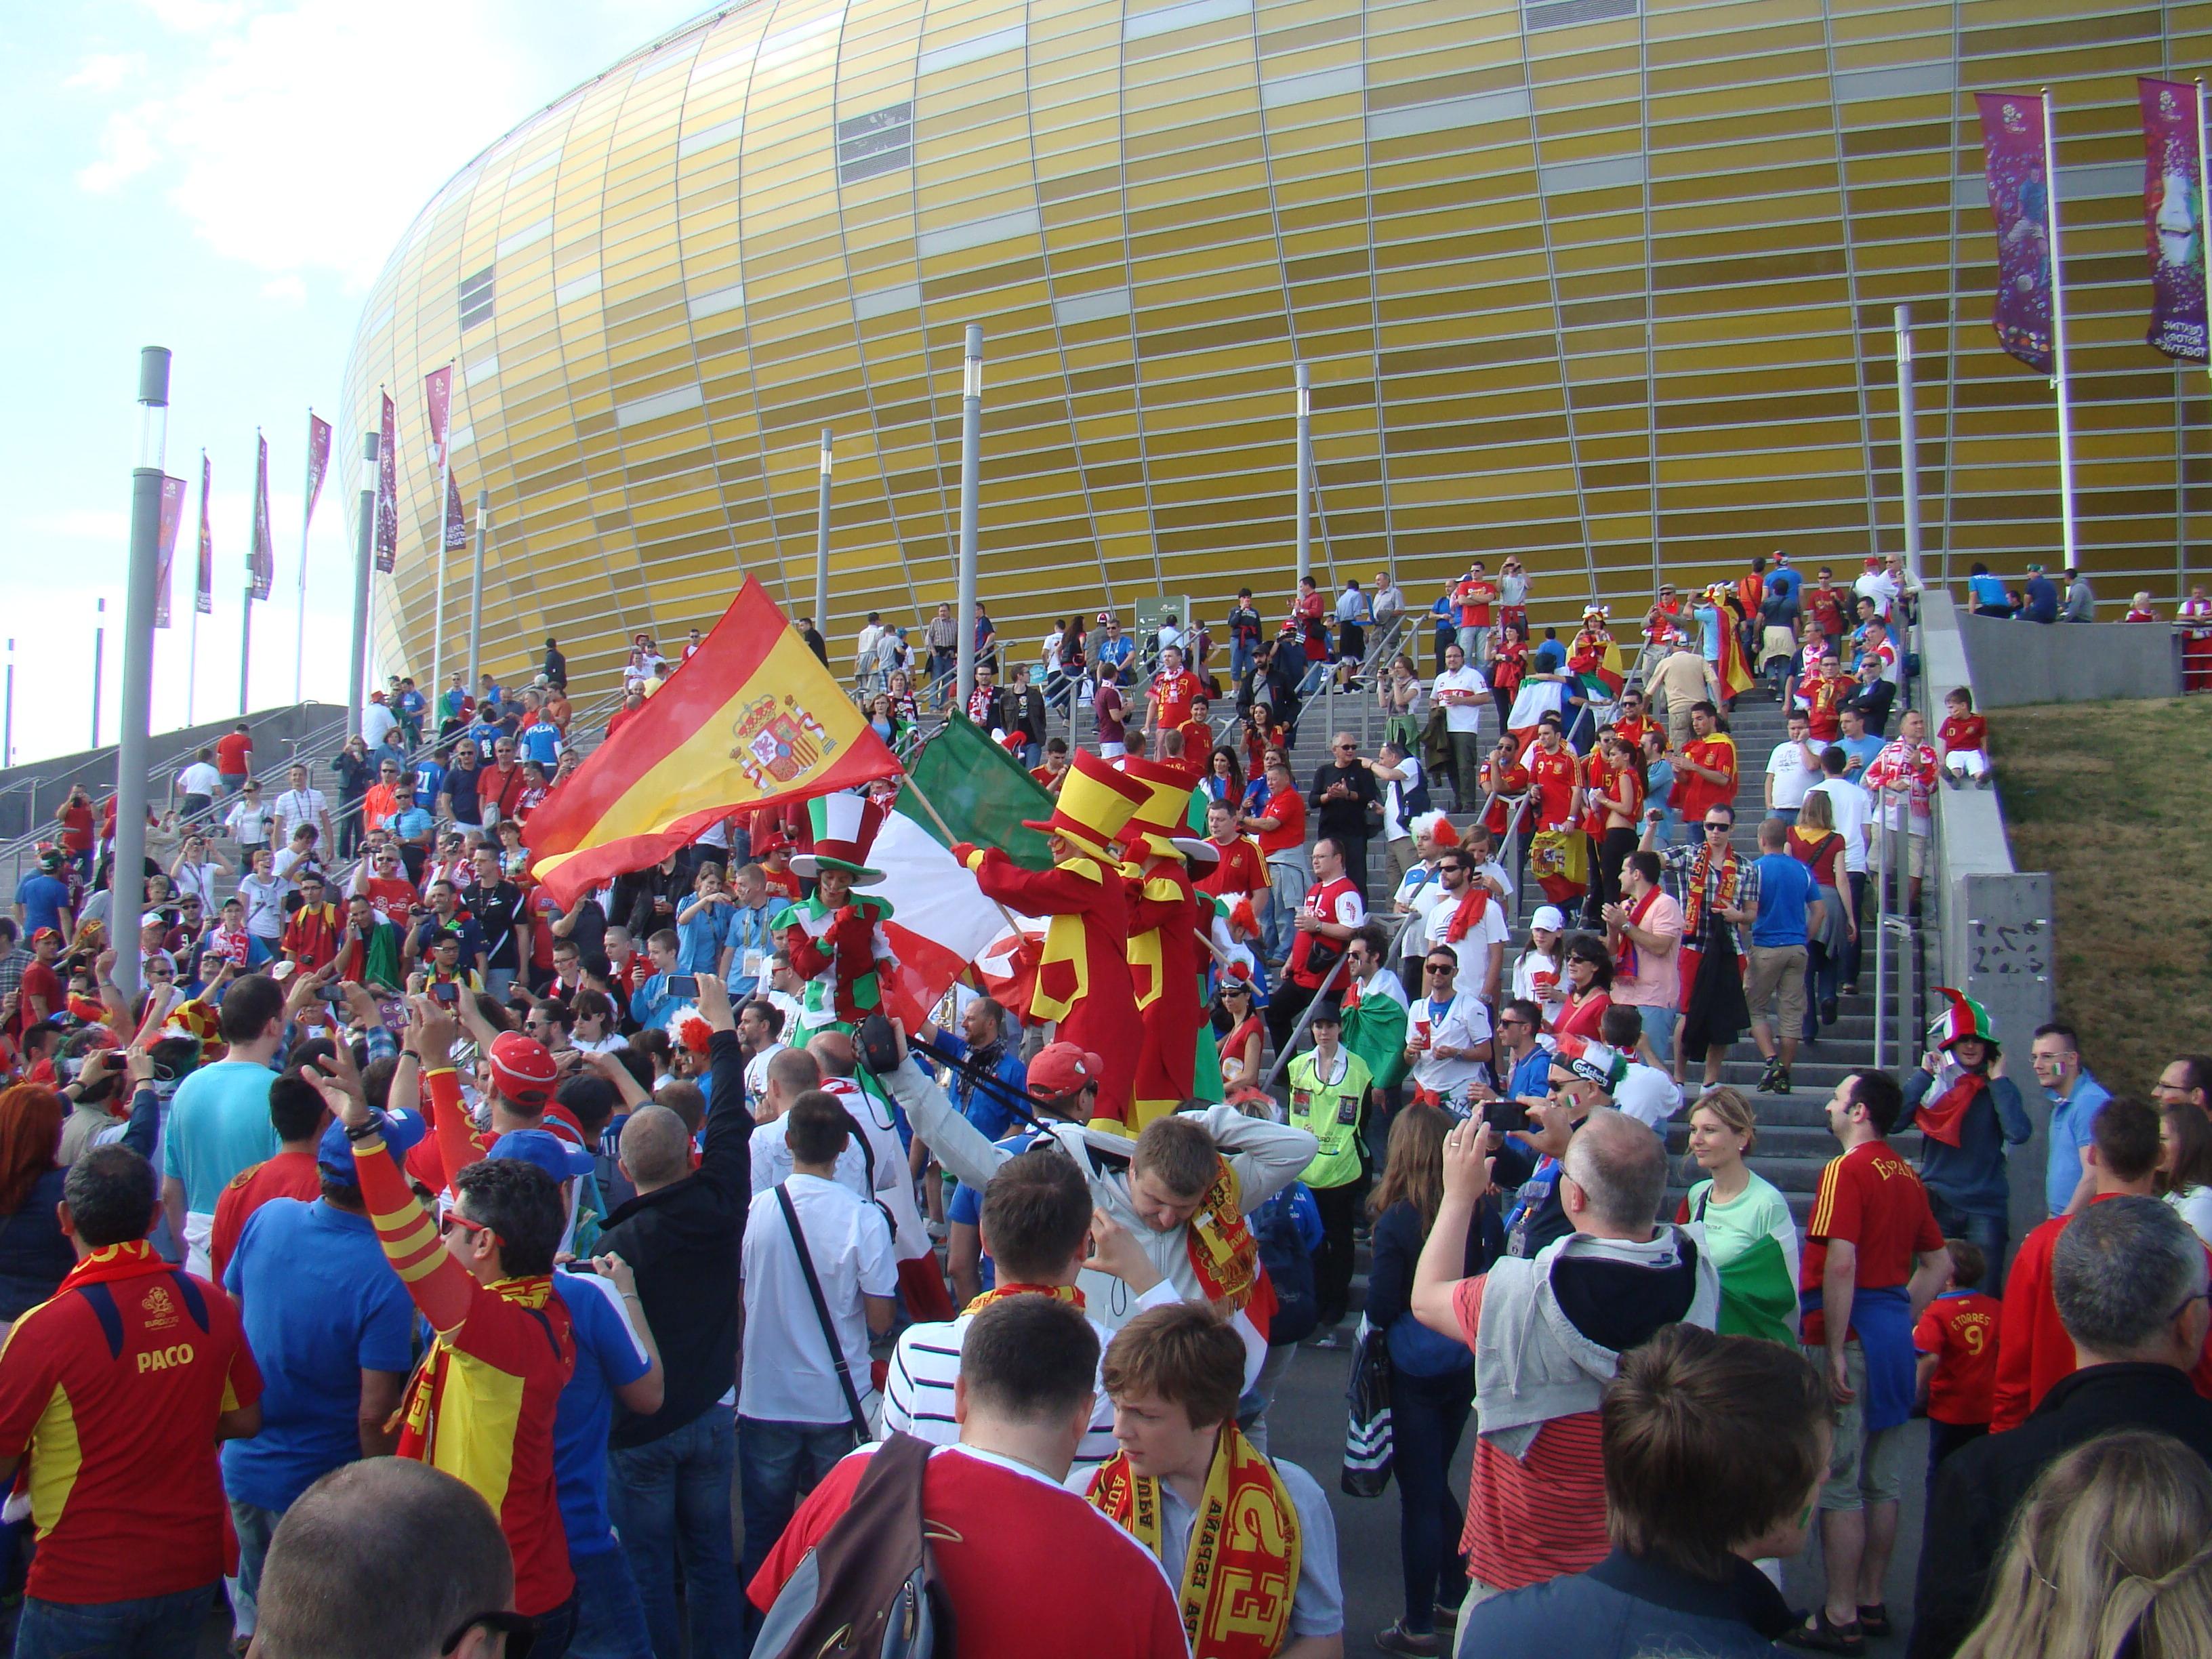 File:SPA-ITA Euro 2012 supporters outside the stadium.JPG - Wikimedia  Commons